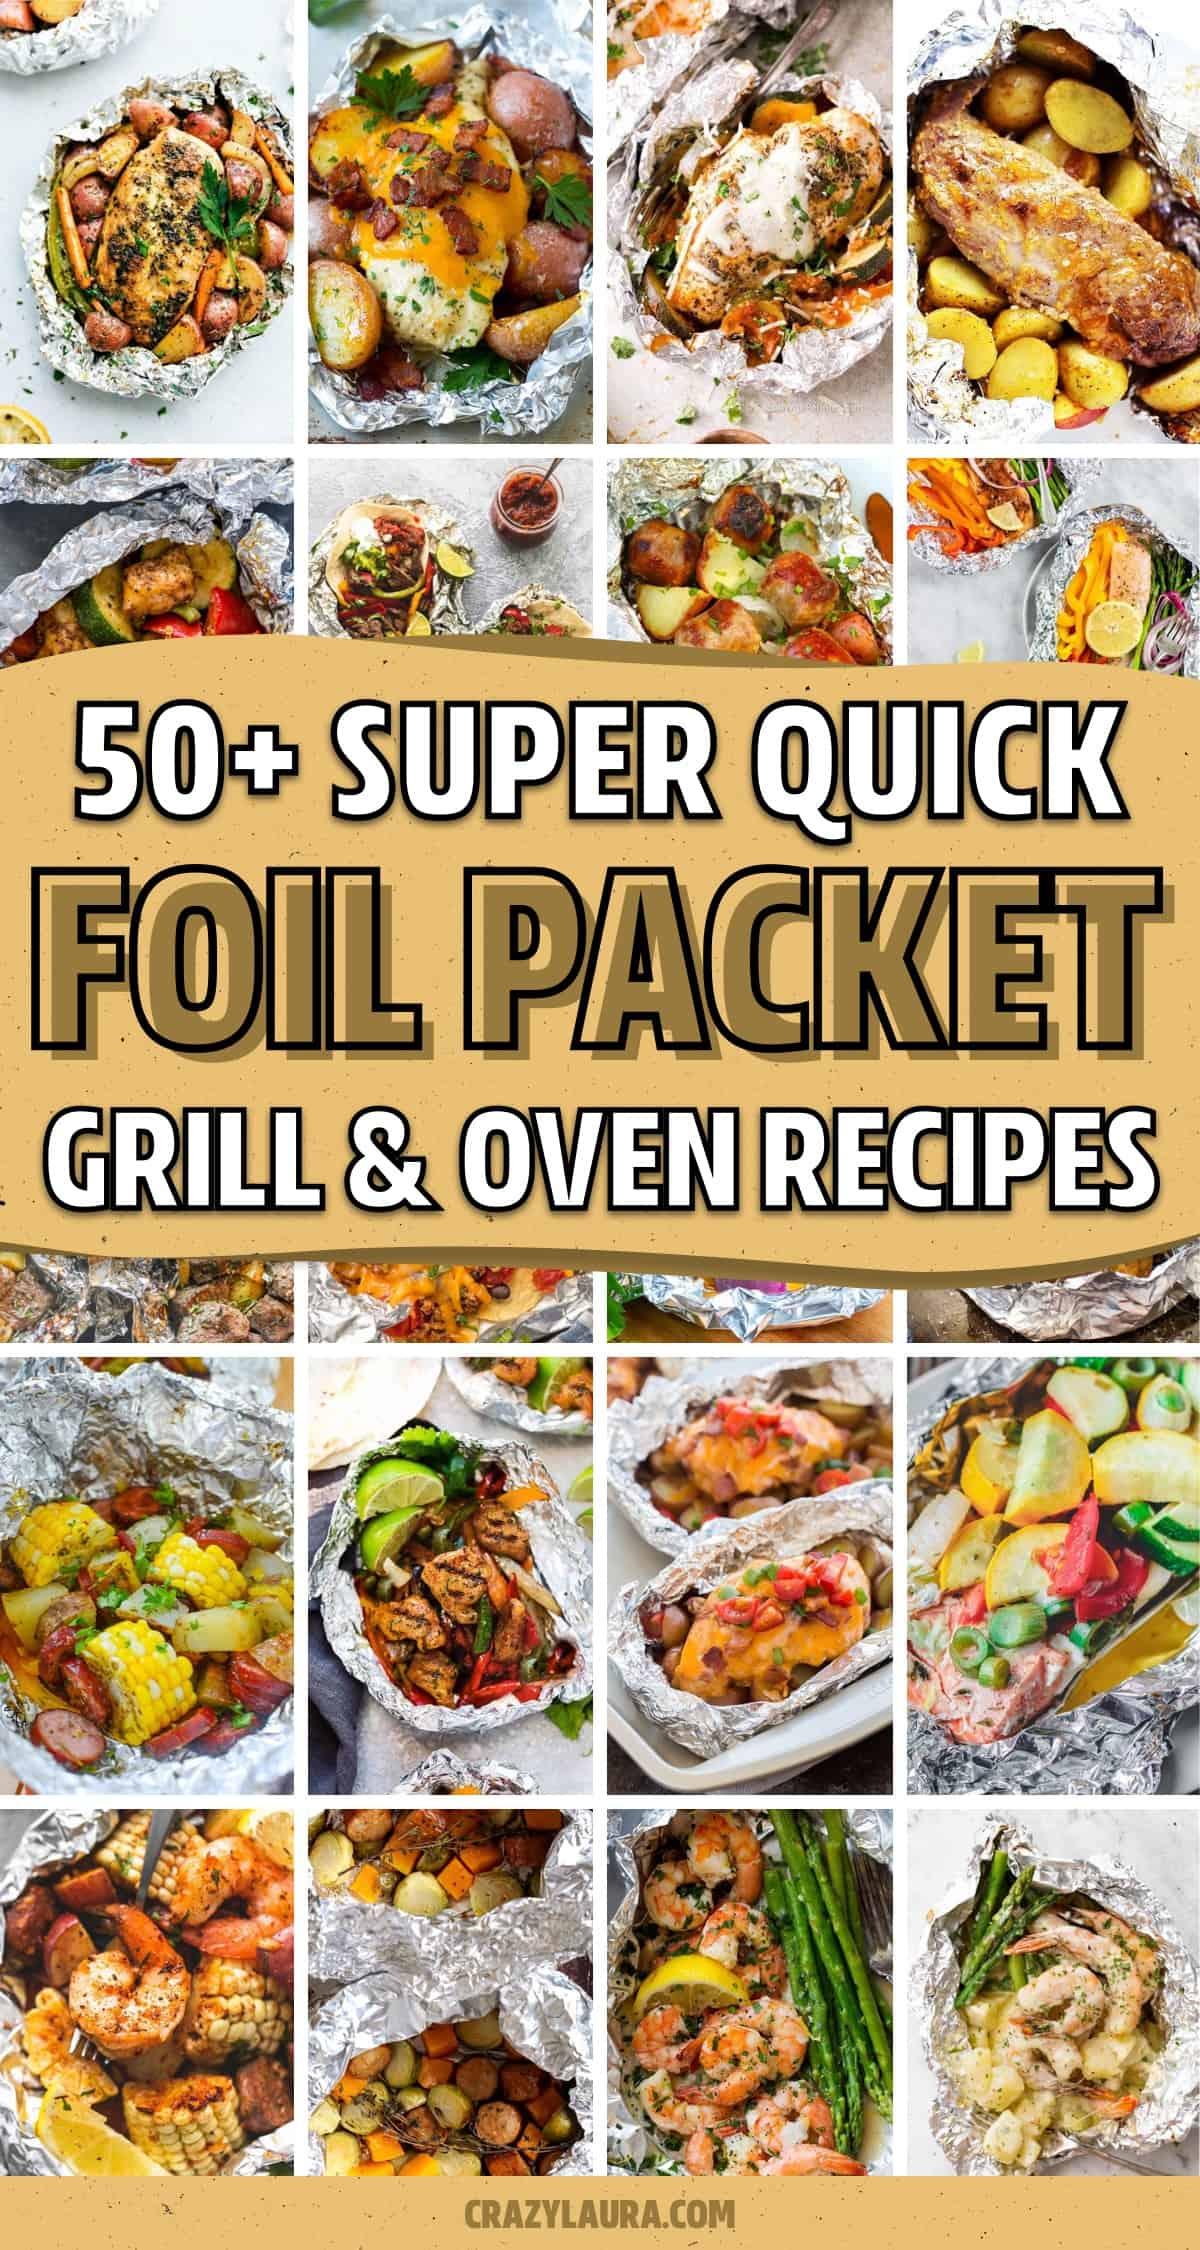 quick foil packet food ideas